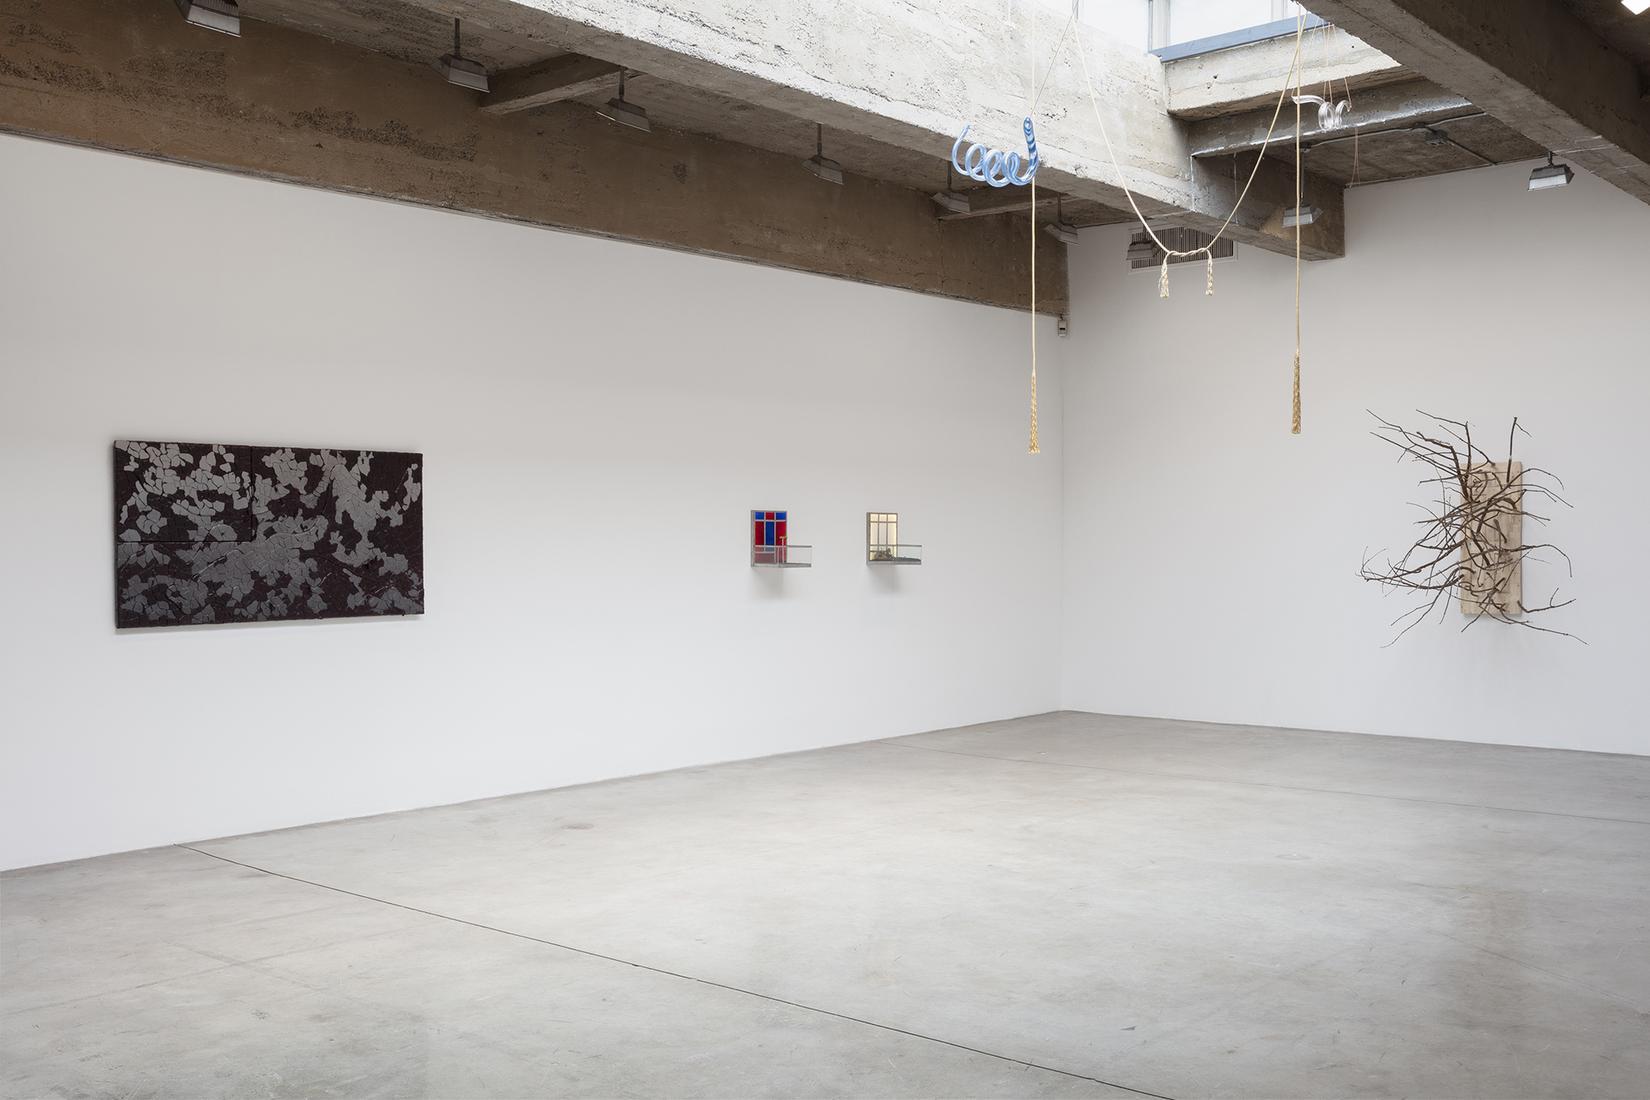 Pine Barrens - Exhibitions